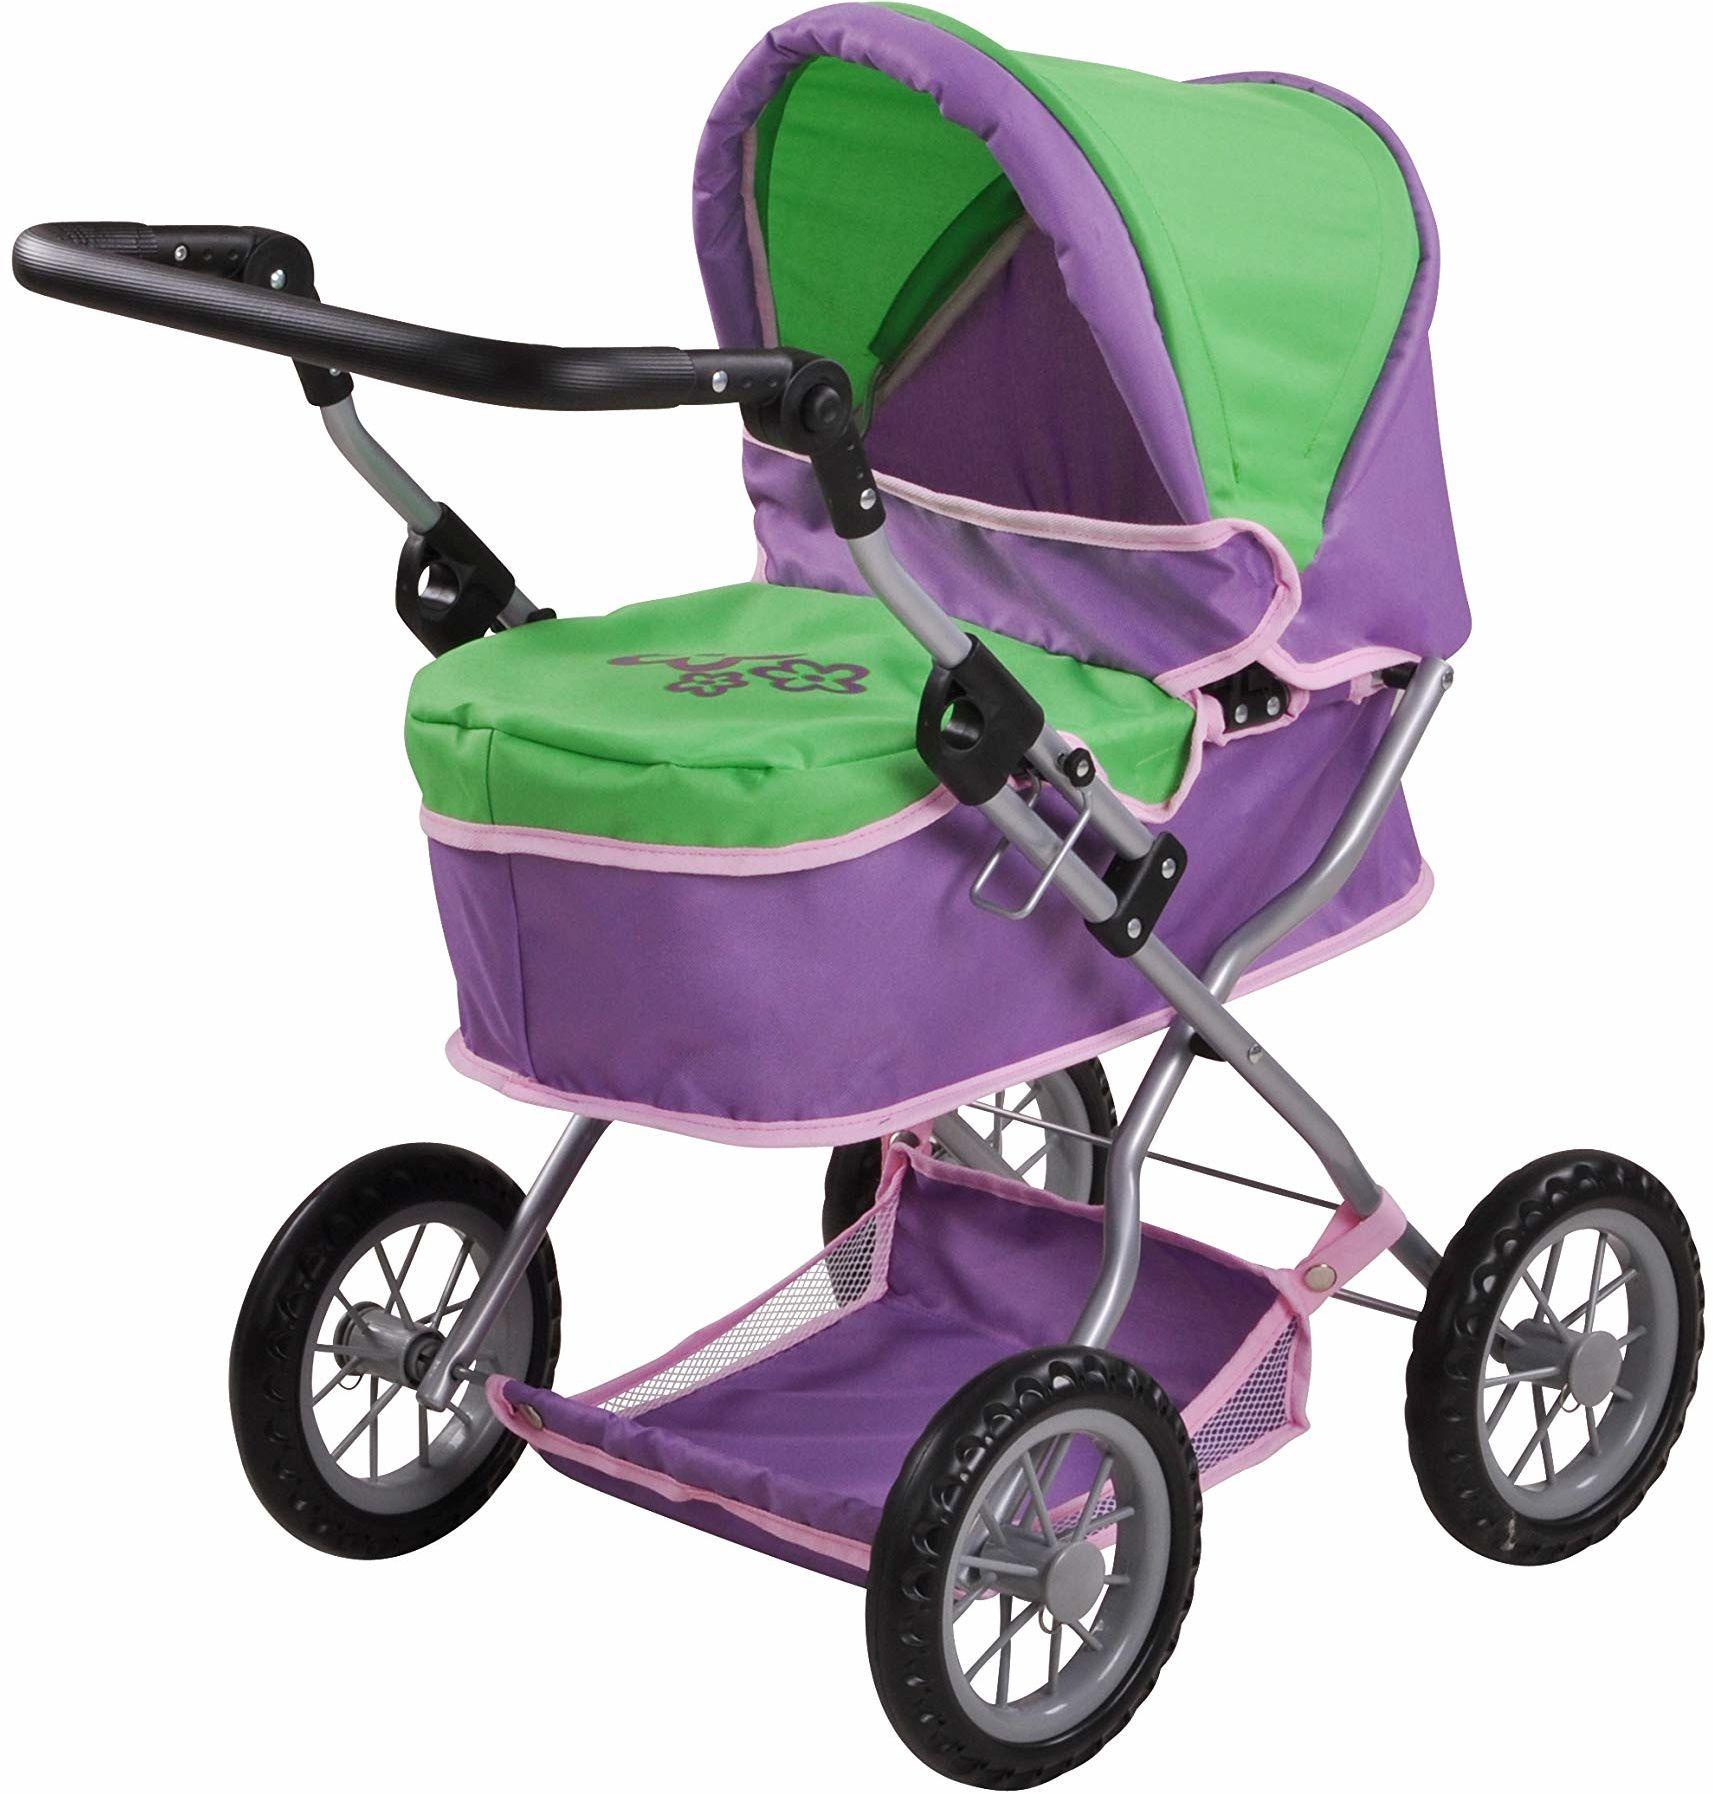 Knorrtoys 63432 - wózek dla lalek First - Plum and Green